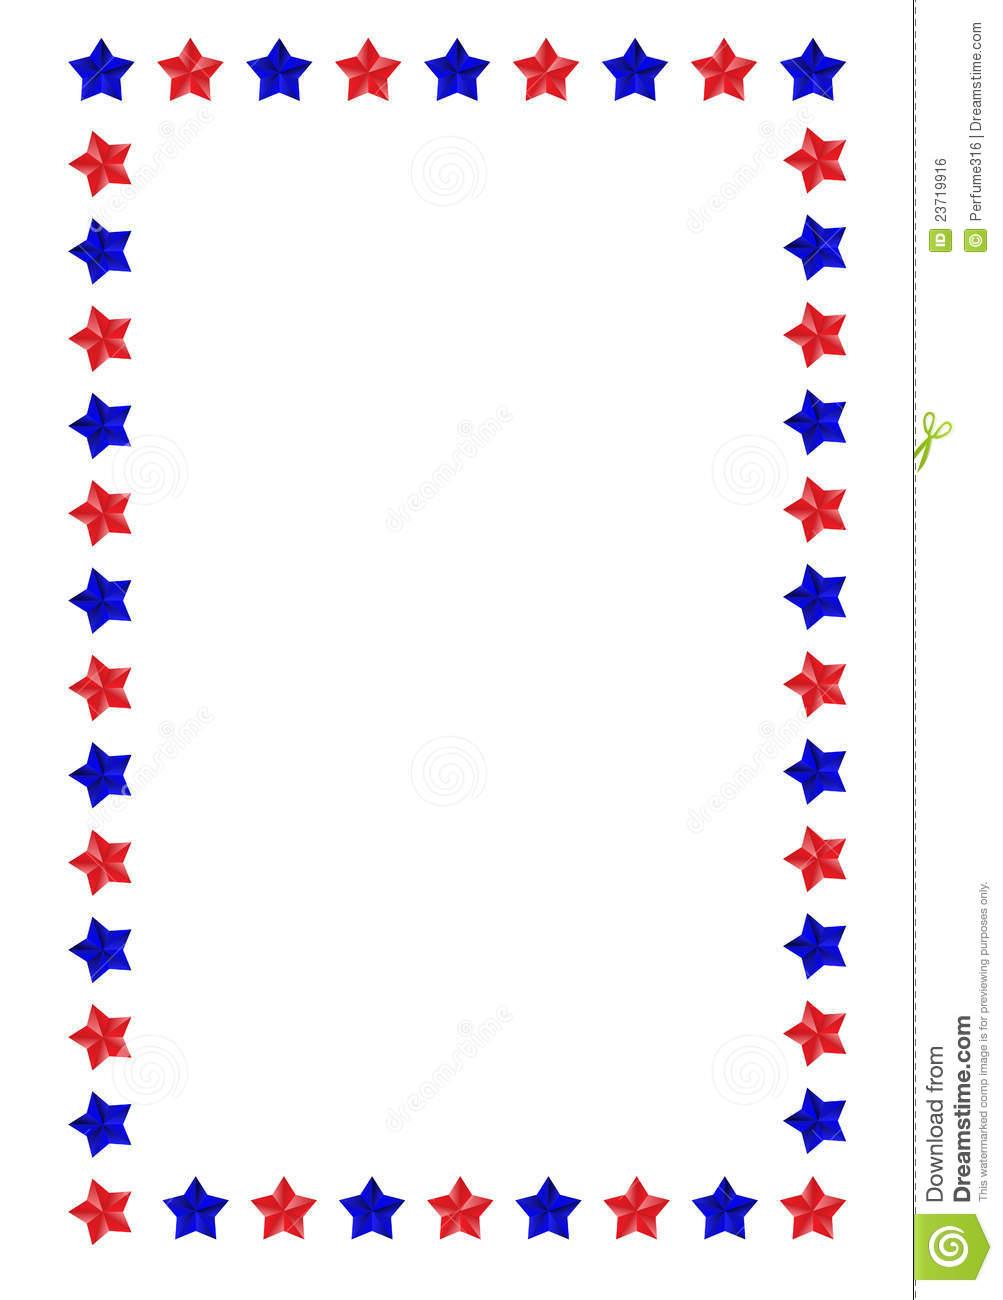 1003x1300 American Star Border Clipart